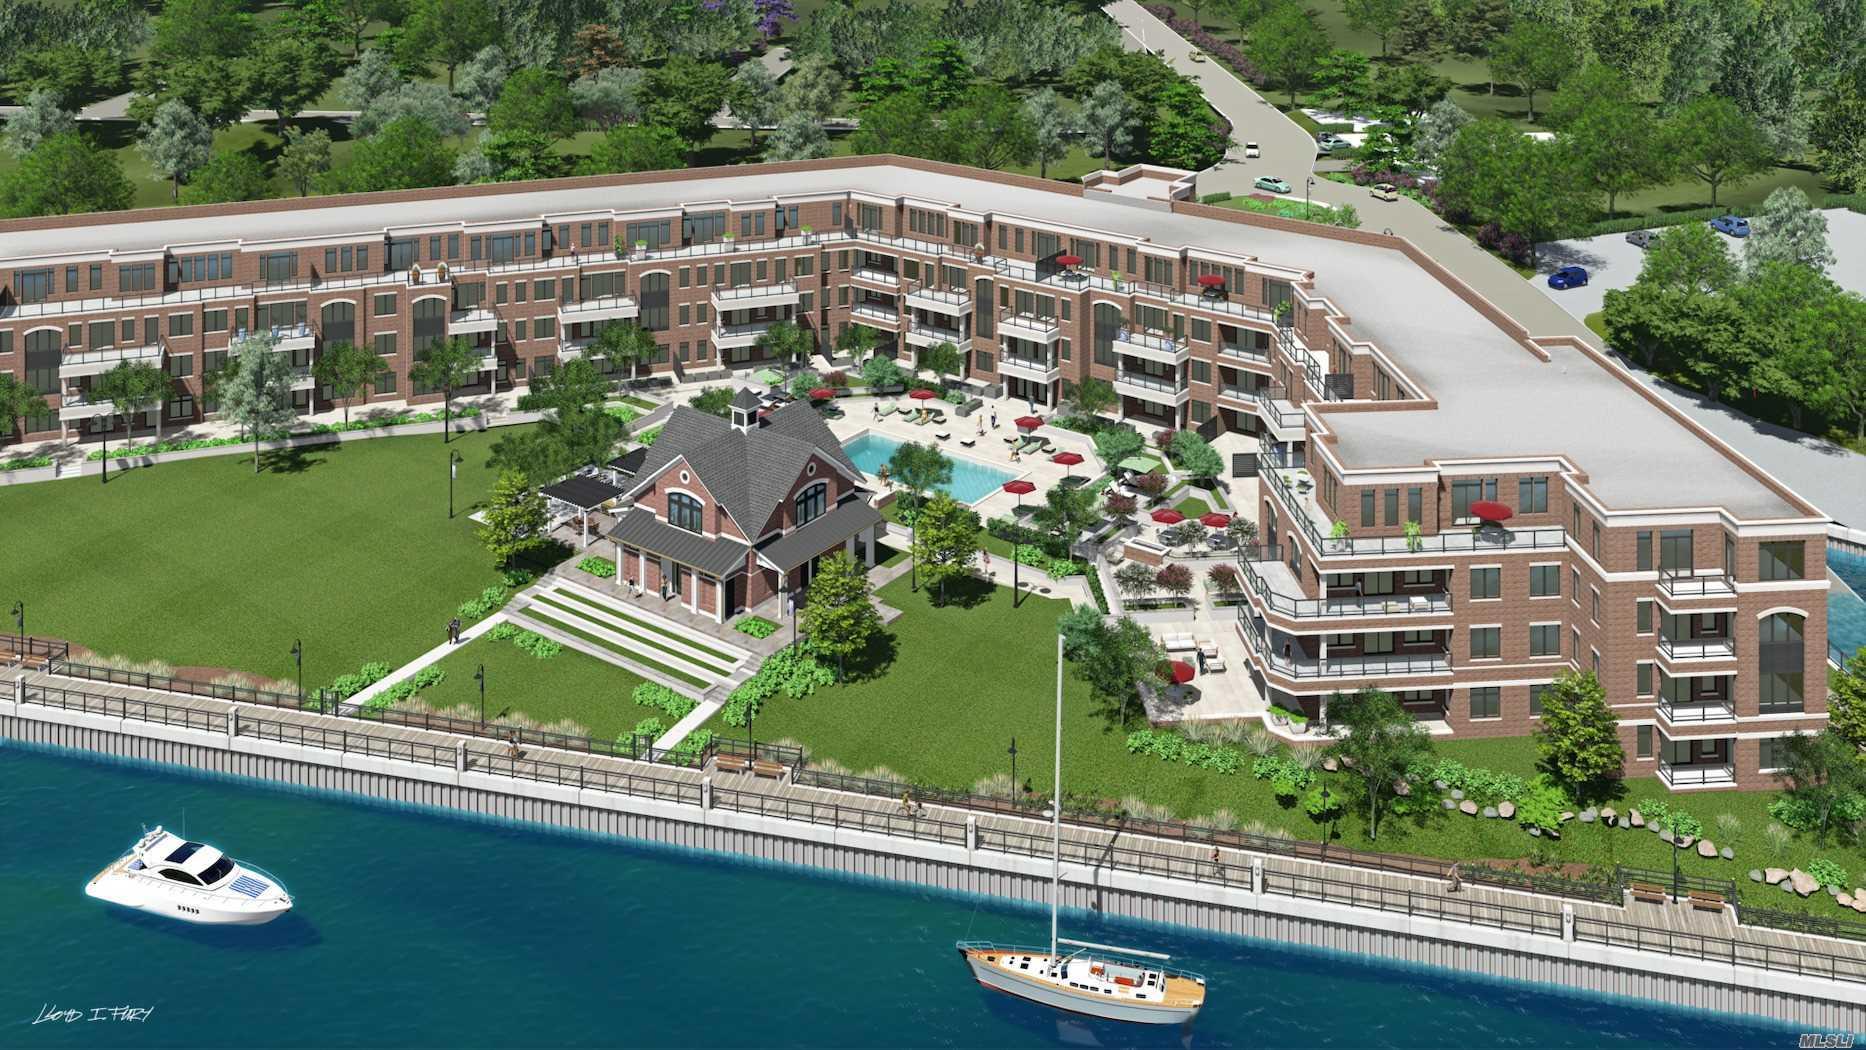 Property for sale at 10 Shore Road # 212, Glenwood Landing NY 11547, Glenwood Landing,  New York 11547